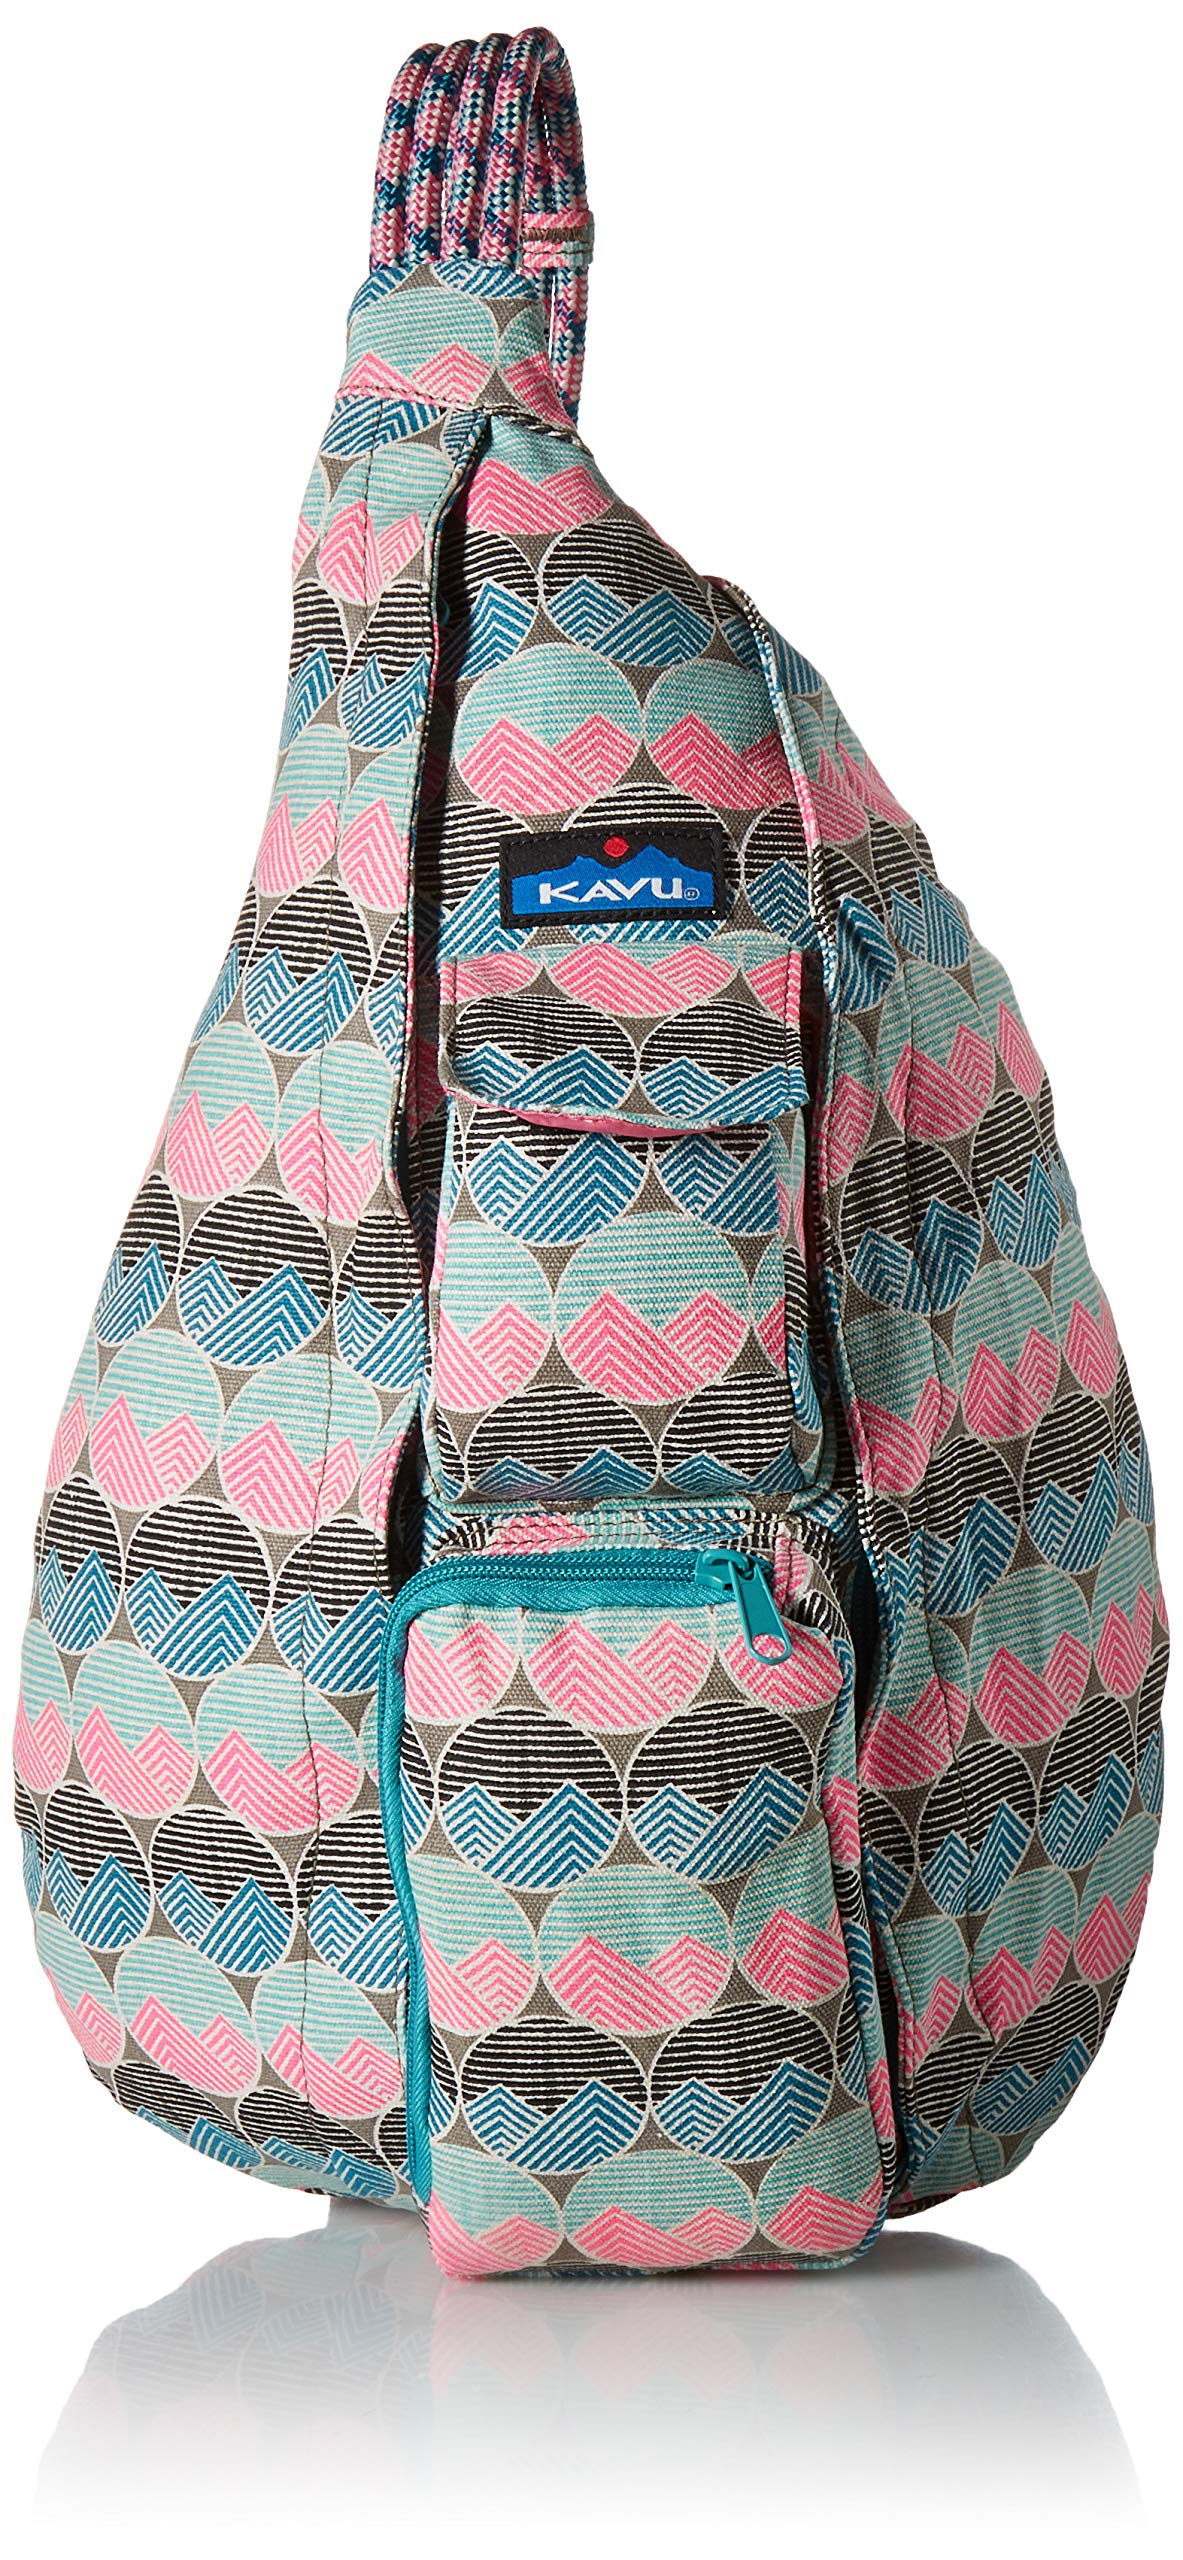 KAVU Women's Rope Bag, Horizon Dots, No Size